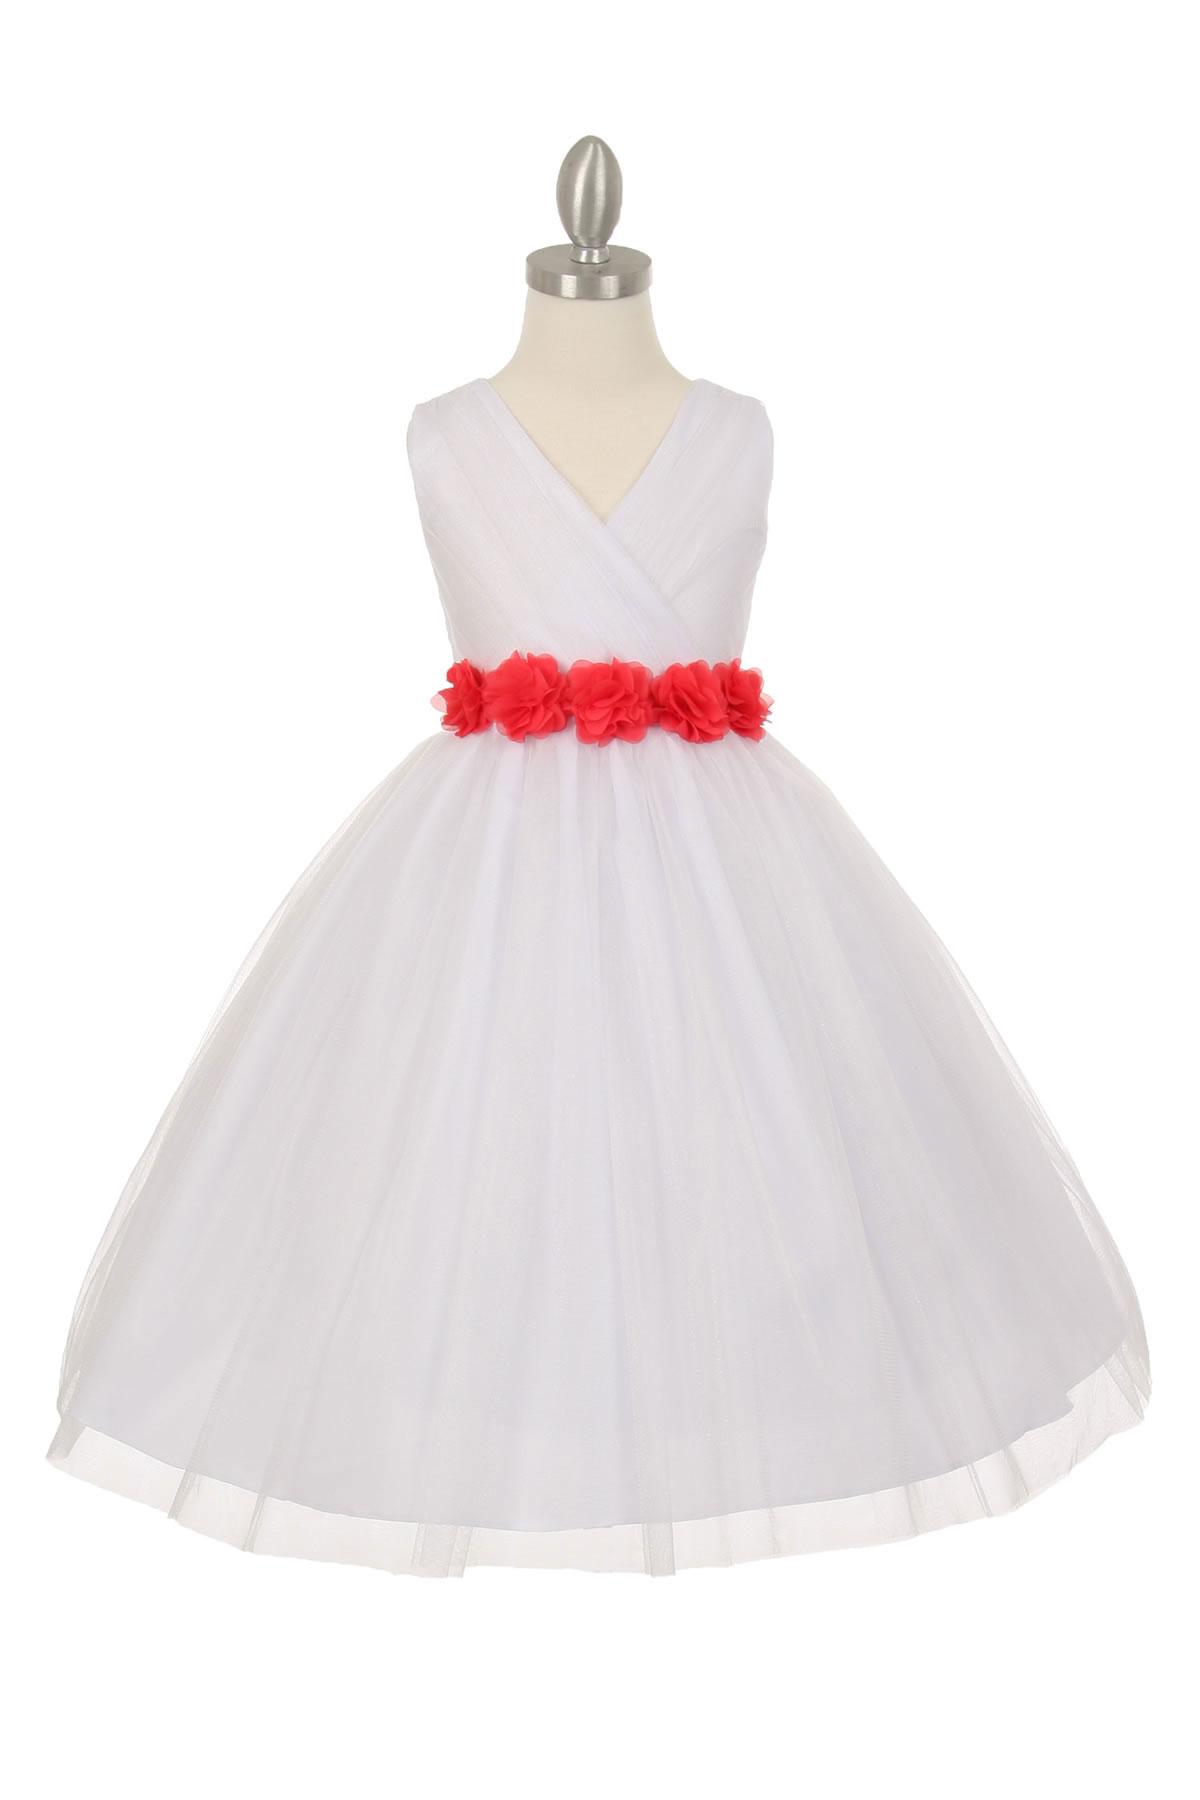 CC 1220WHCO Girls Dress Style 1220 WHITE Dress with 14 Sash Options Whi